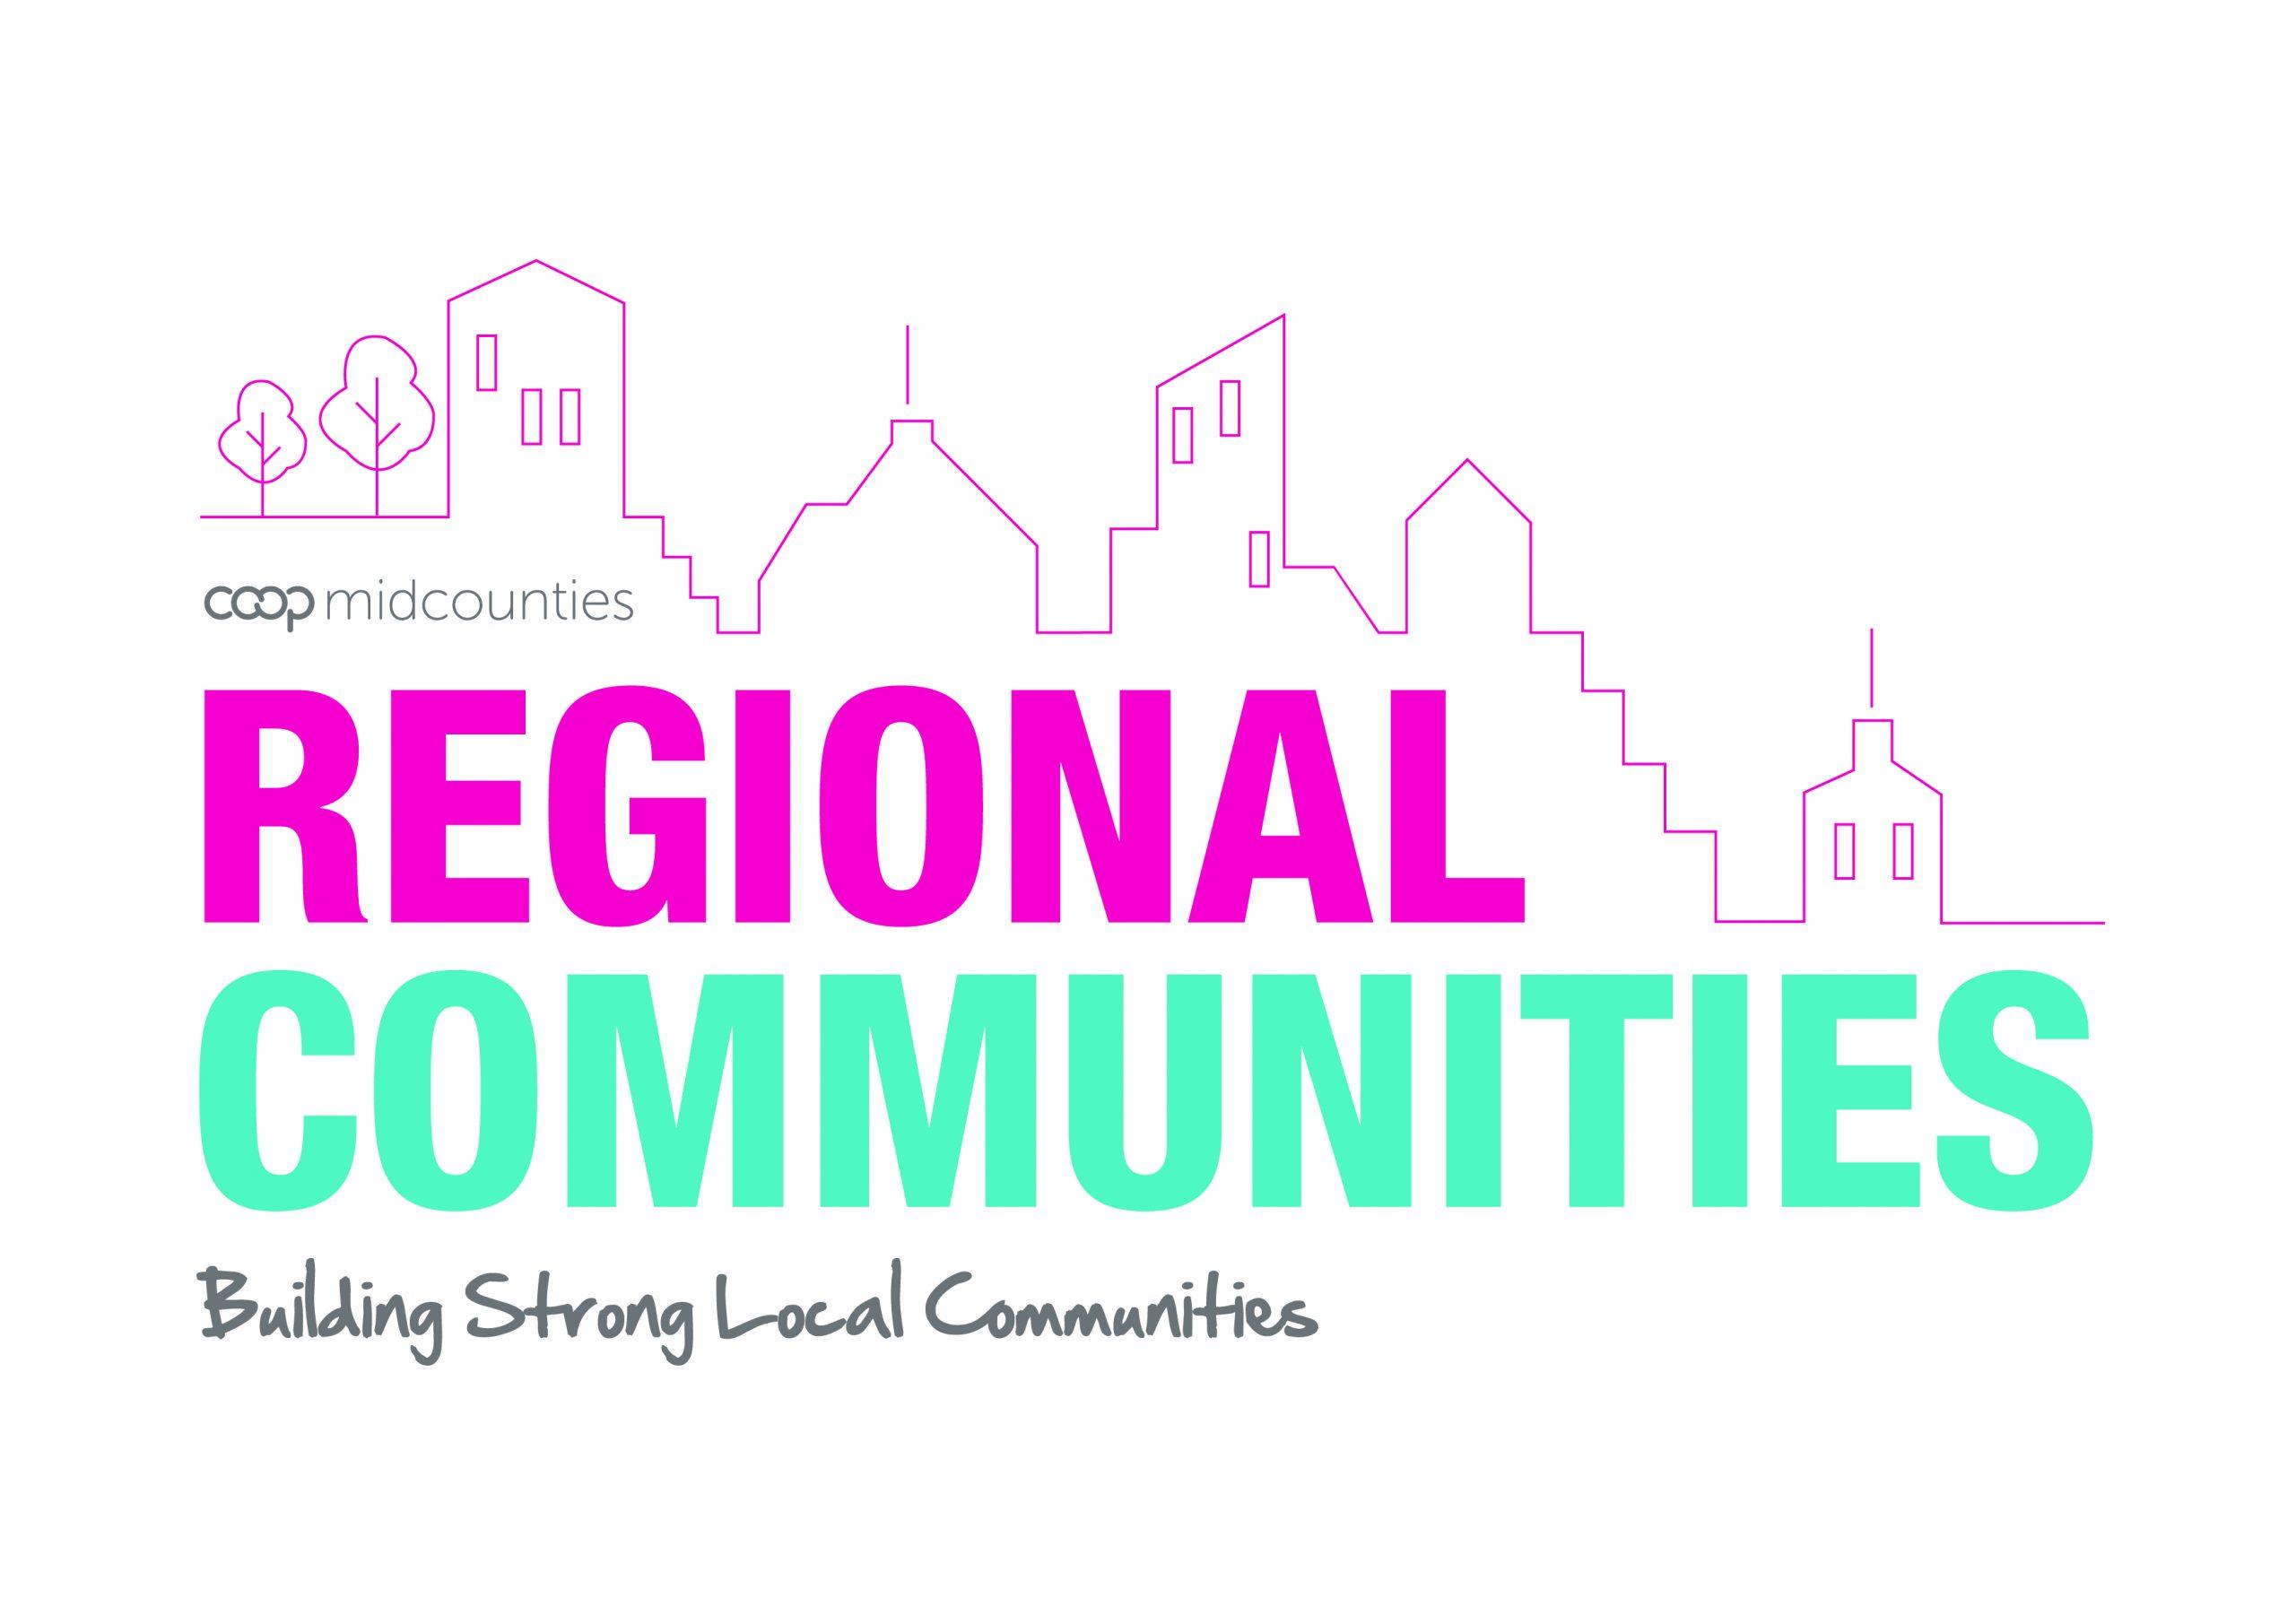 TMC1712-4815 Regional Communities_STACKED LOGO_(With NEW MC logo)__v1-01.._